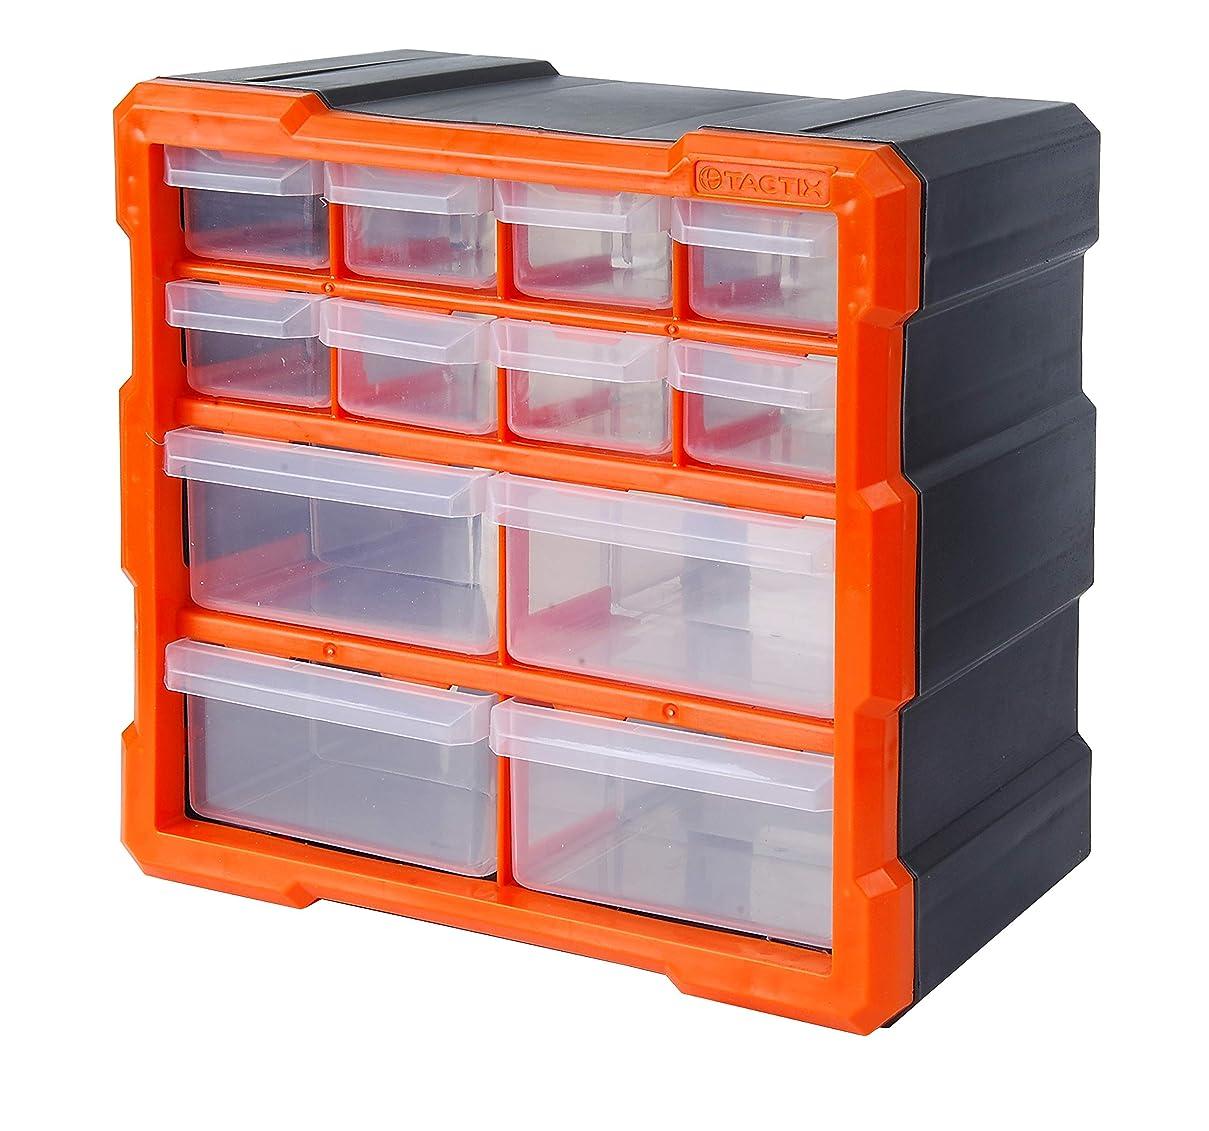 Tactix 320630 12 Drawer Cabinet, Storage & Hardware Parts Organizer, Black/Orange